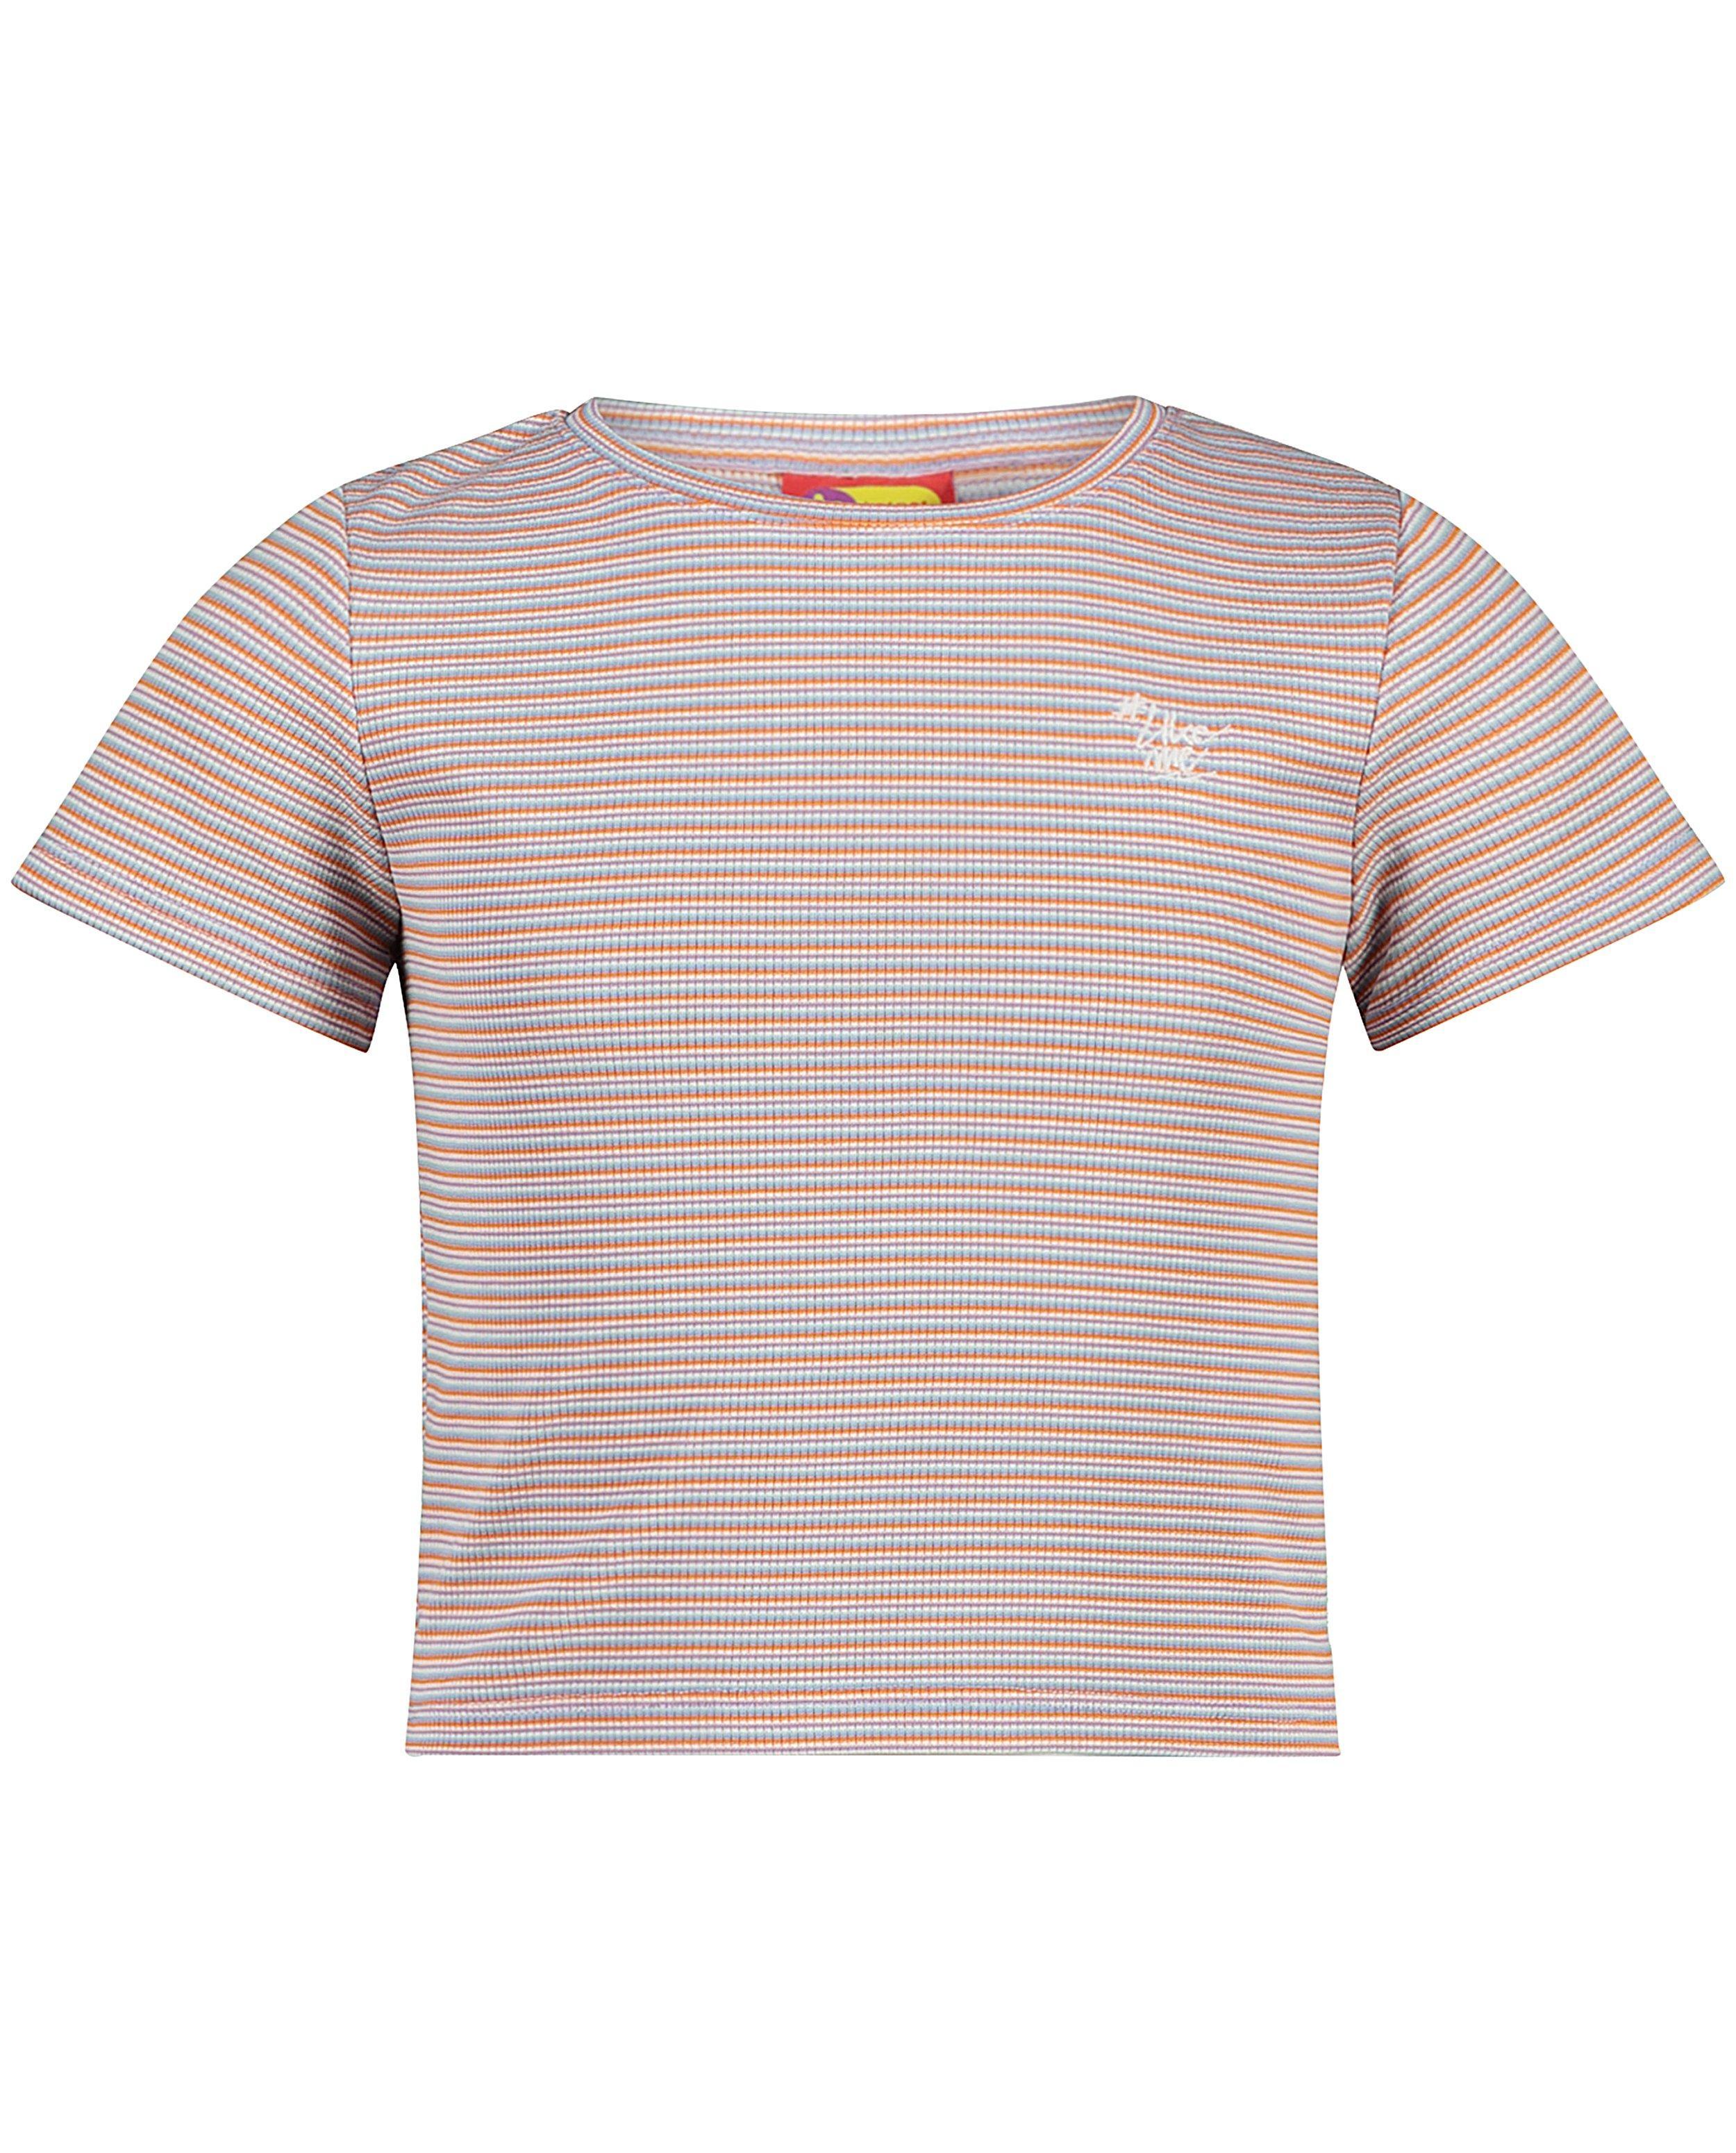 T-shirt rayé #LikeMe